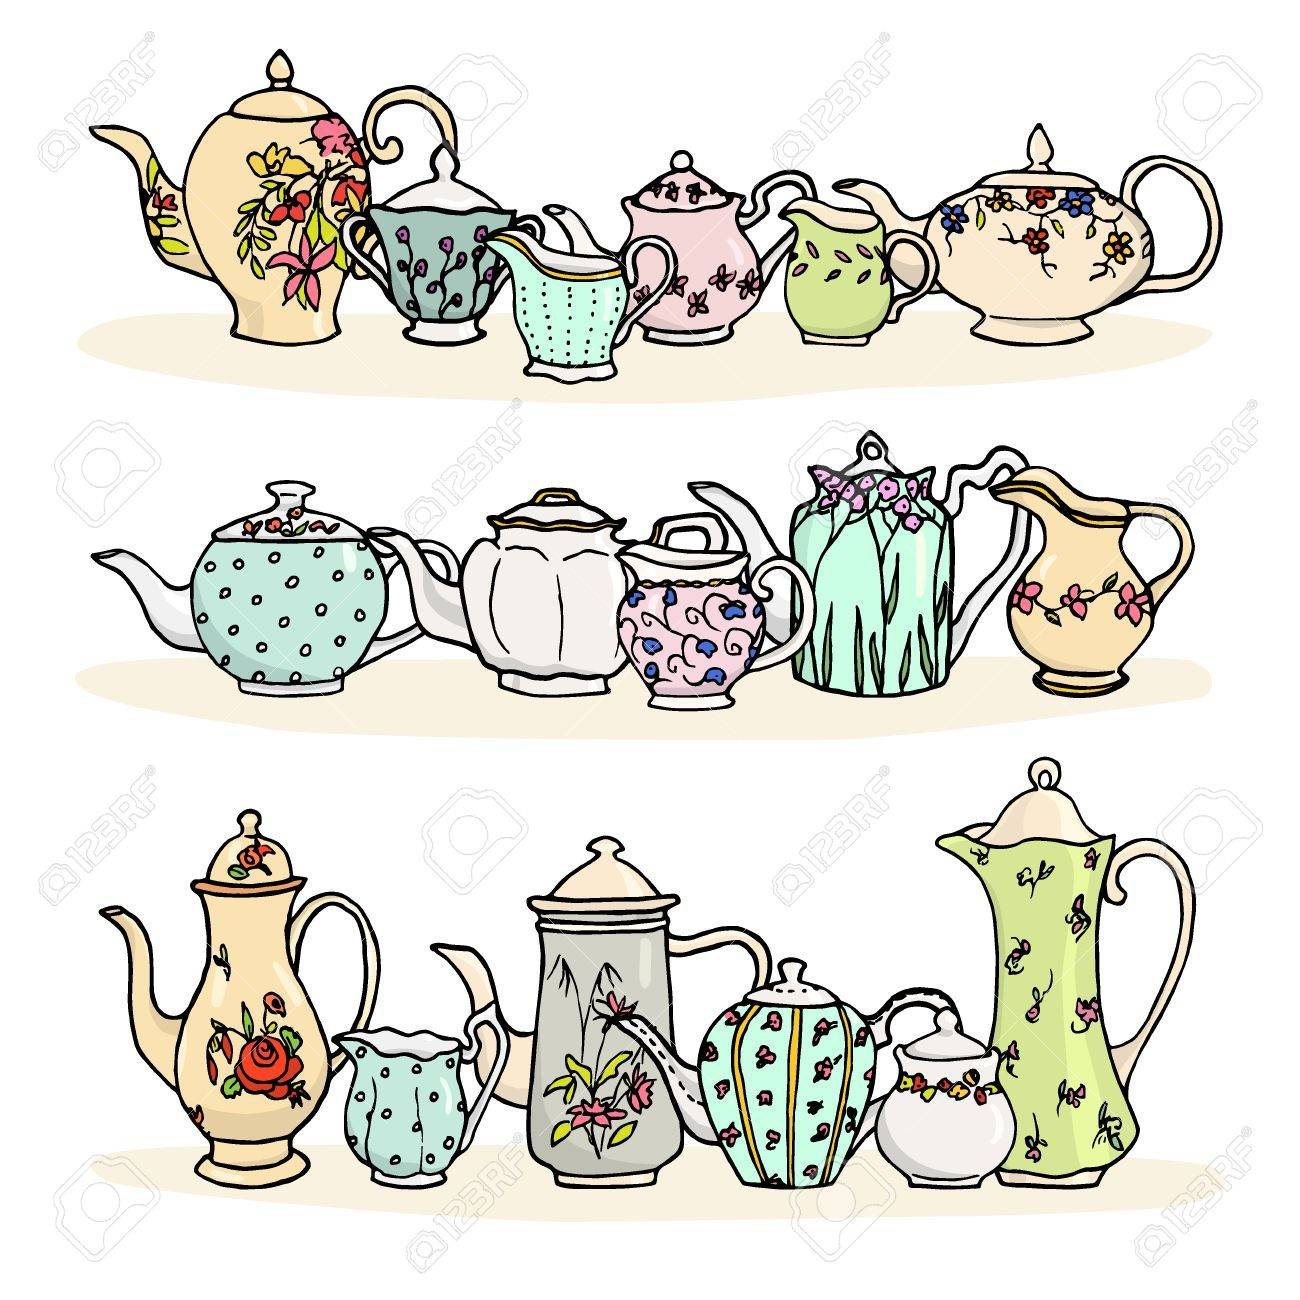 Vector illustration of vintage tea things. Hand drawn porcelain tea pots, sugar bowls and milk jugs. - 51917948